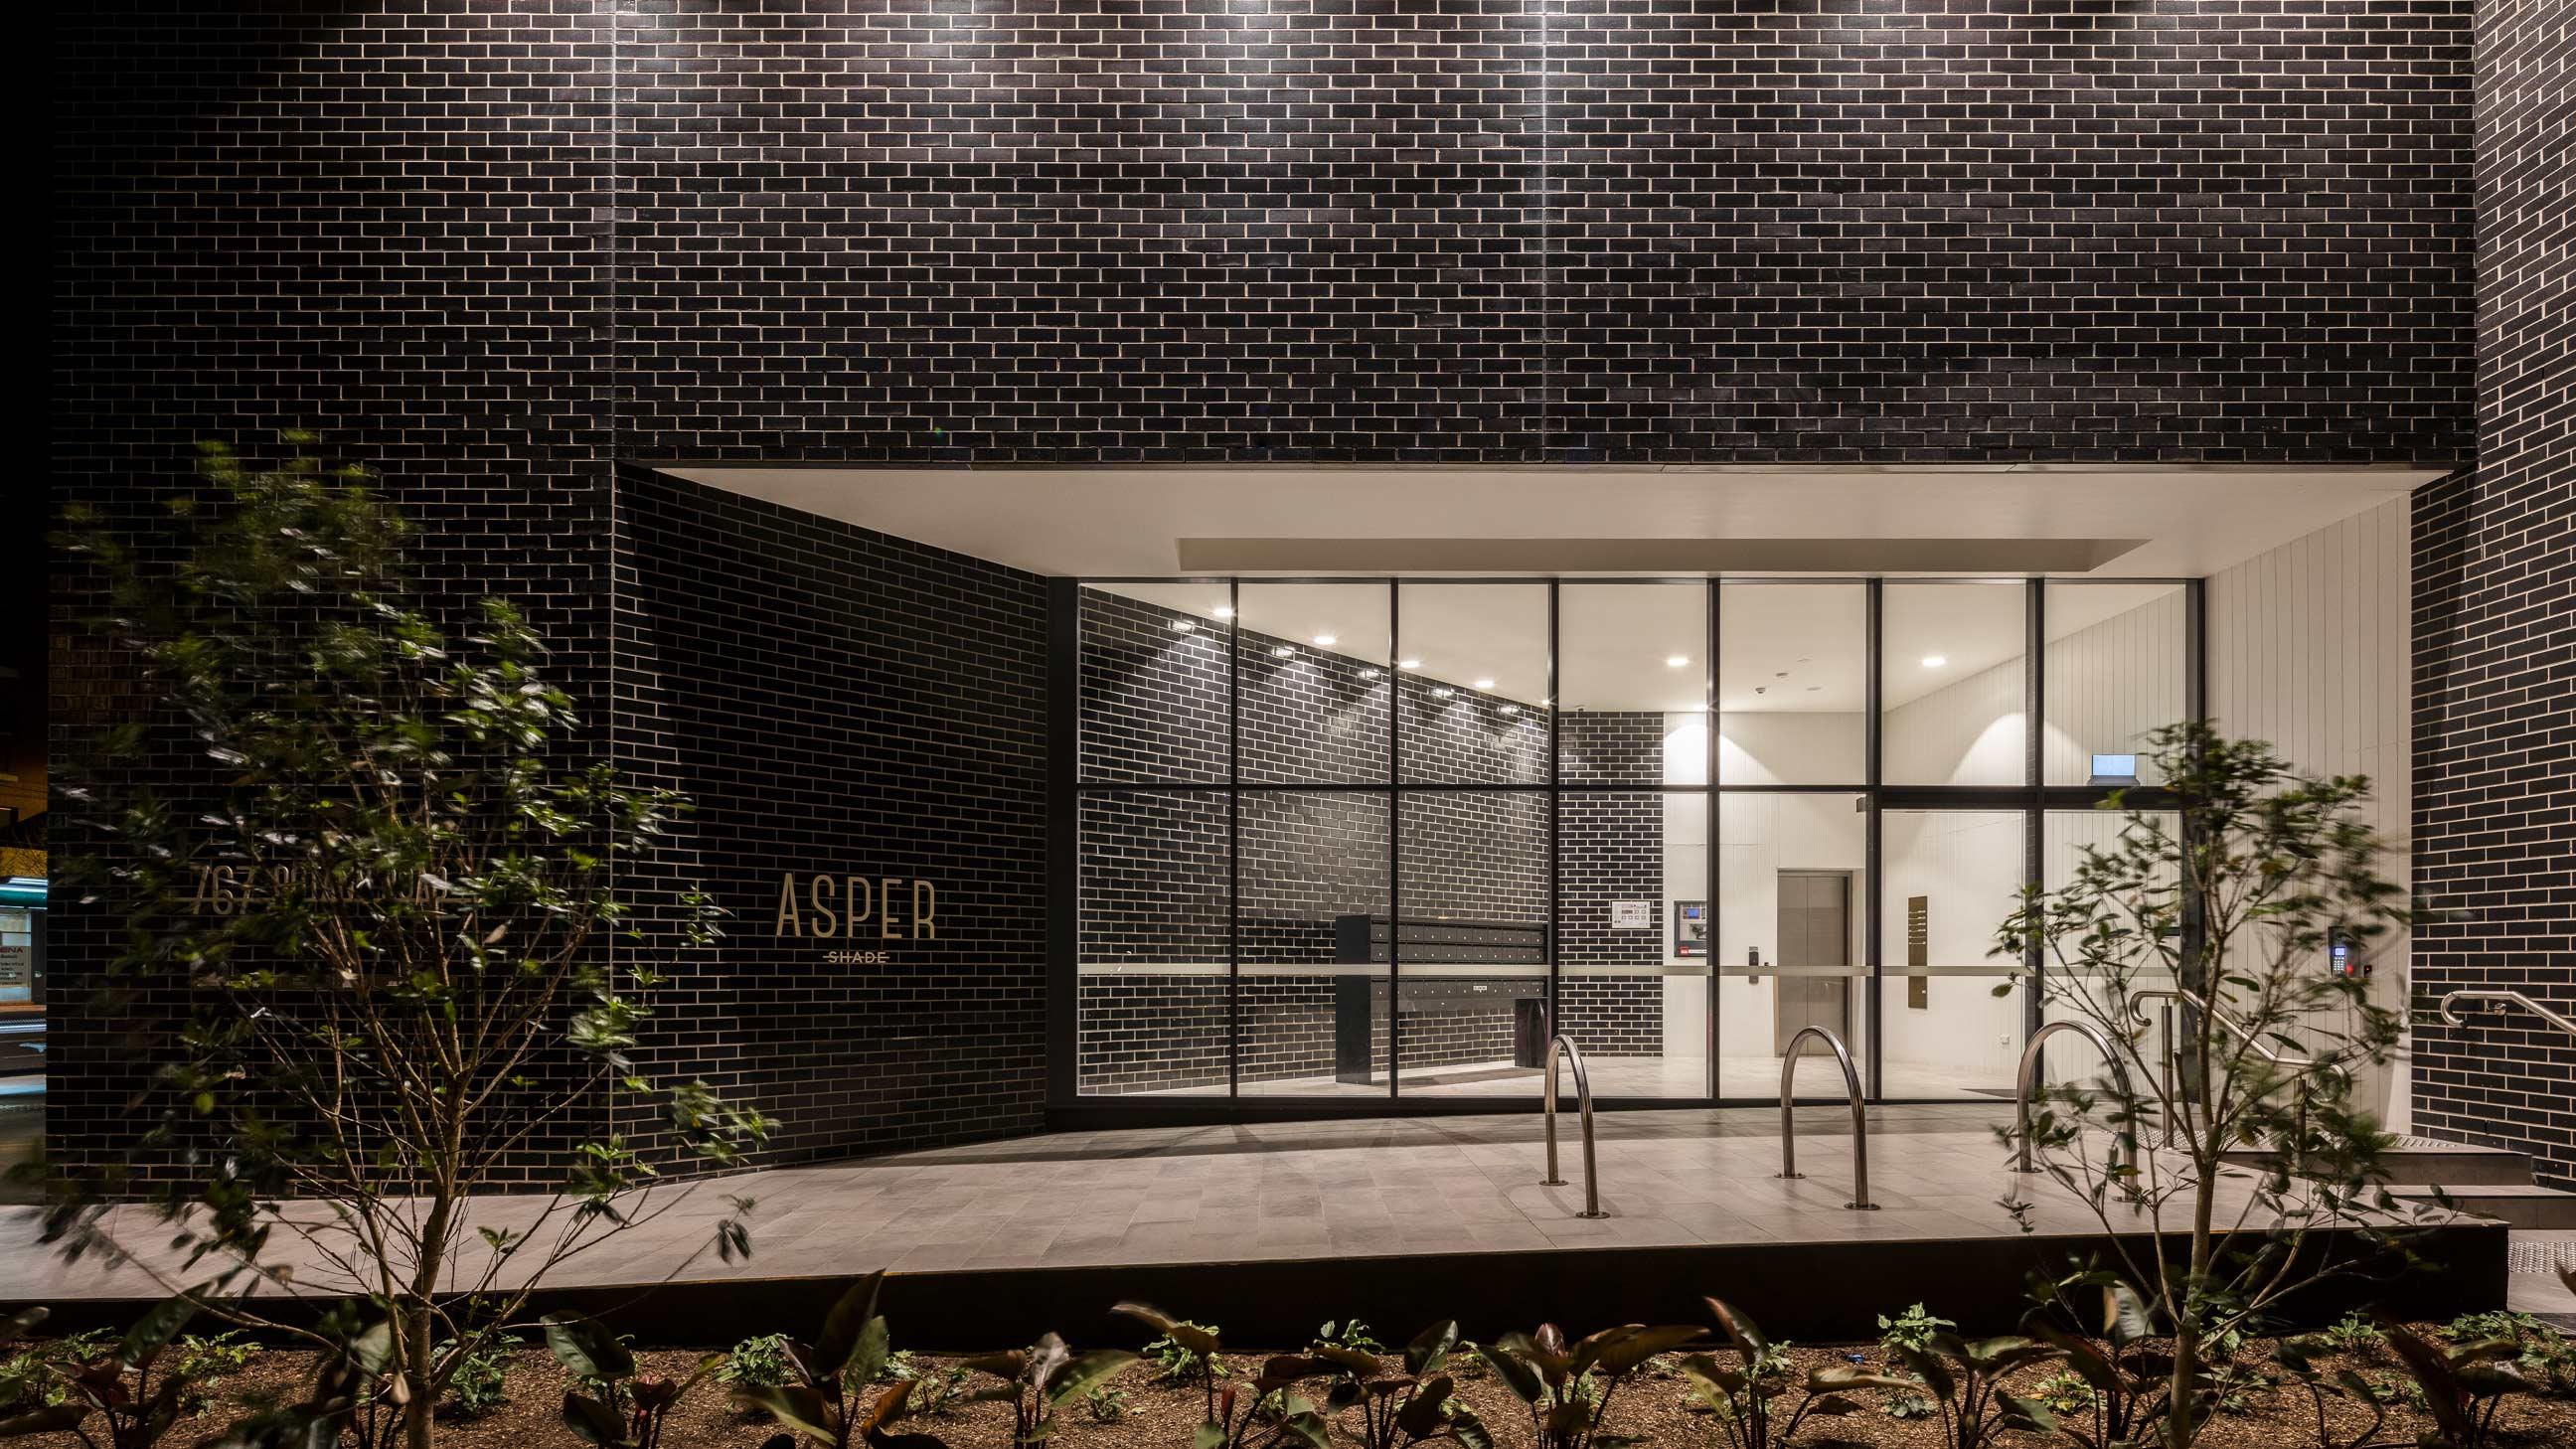 ASPER导视设计© turner studio